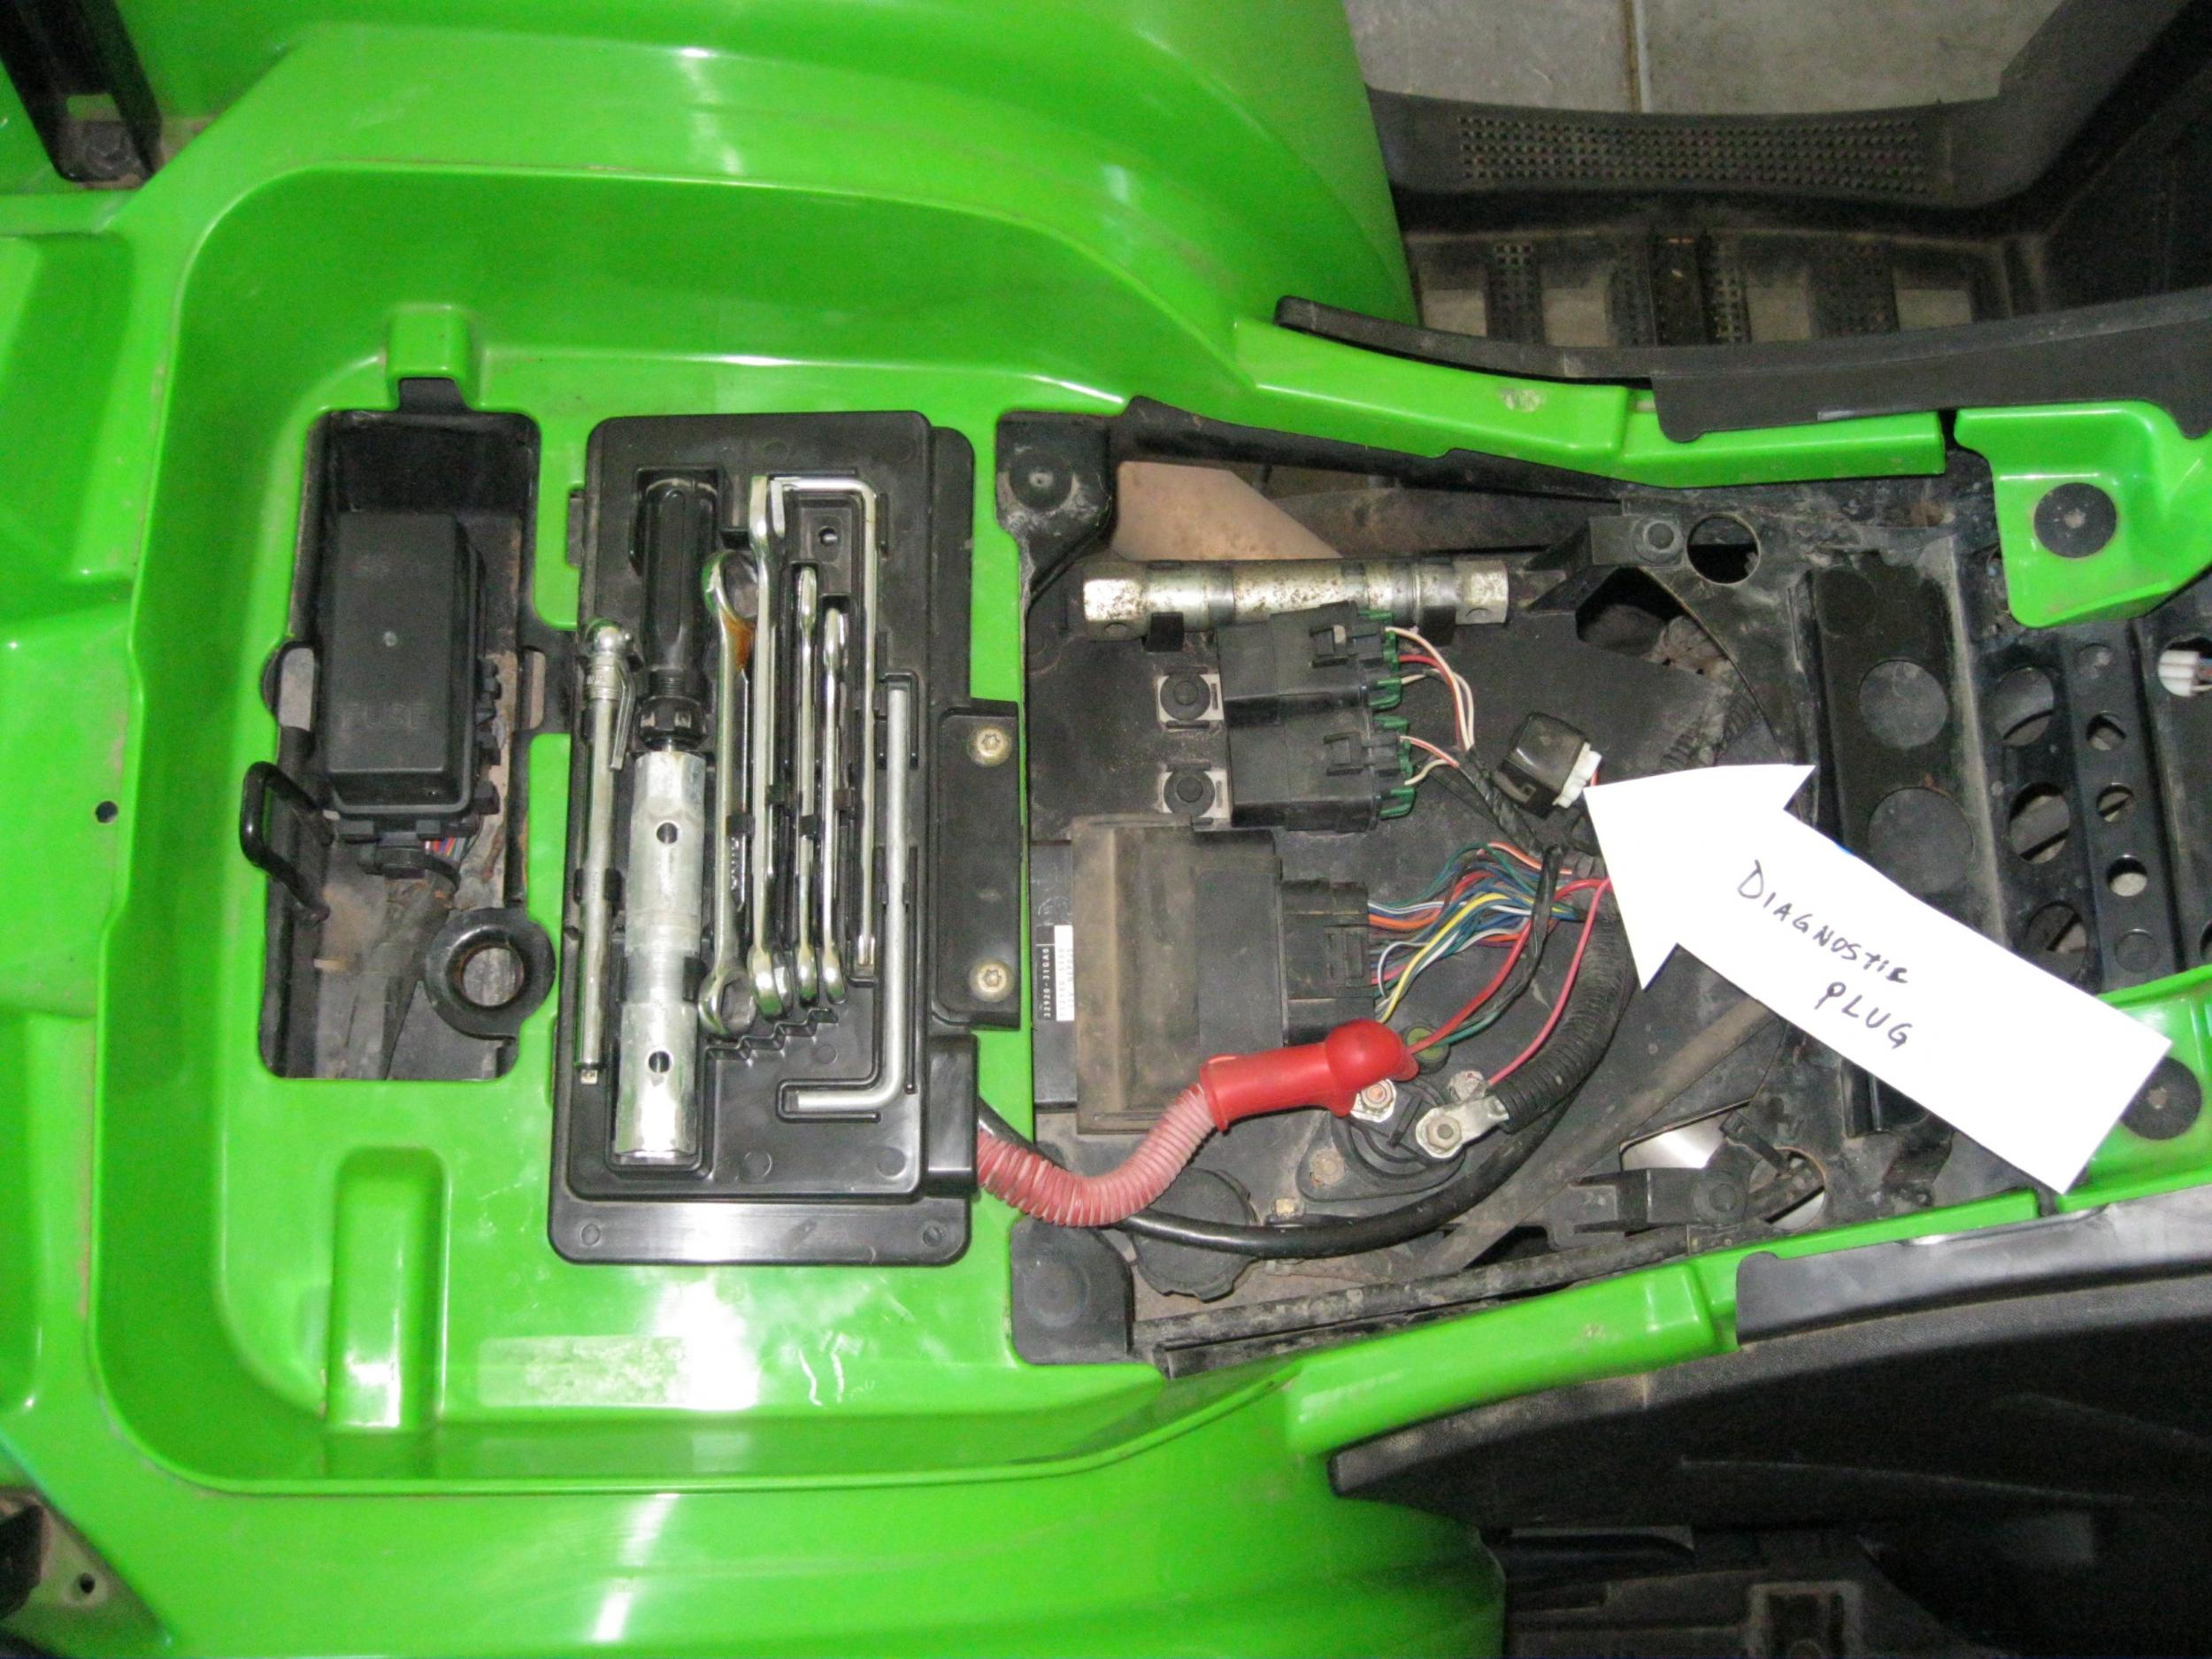 2006 polaris outlaw 500 wiring diagram yamaha yfz450